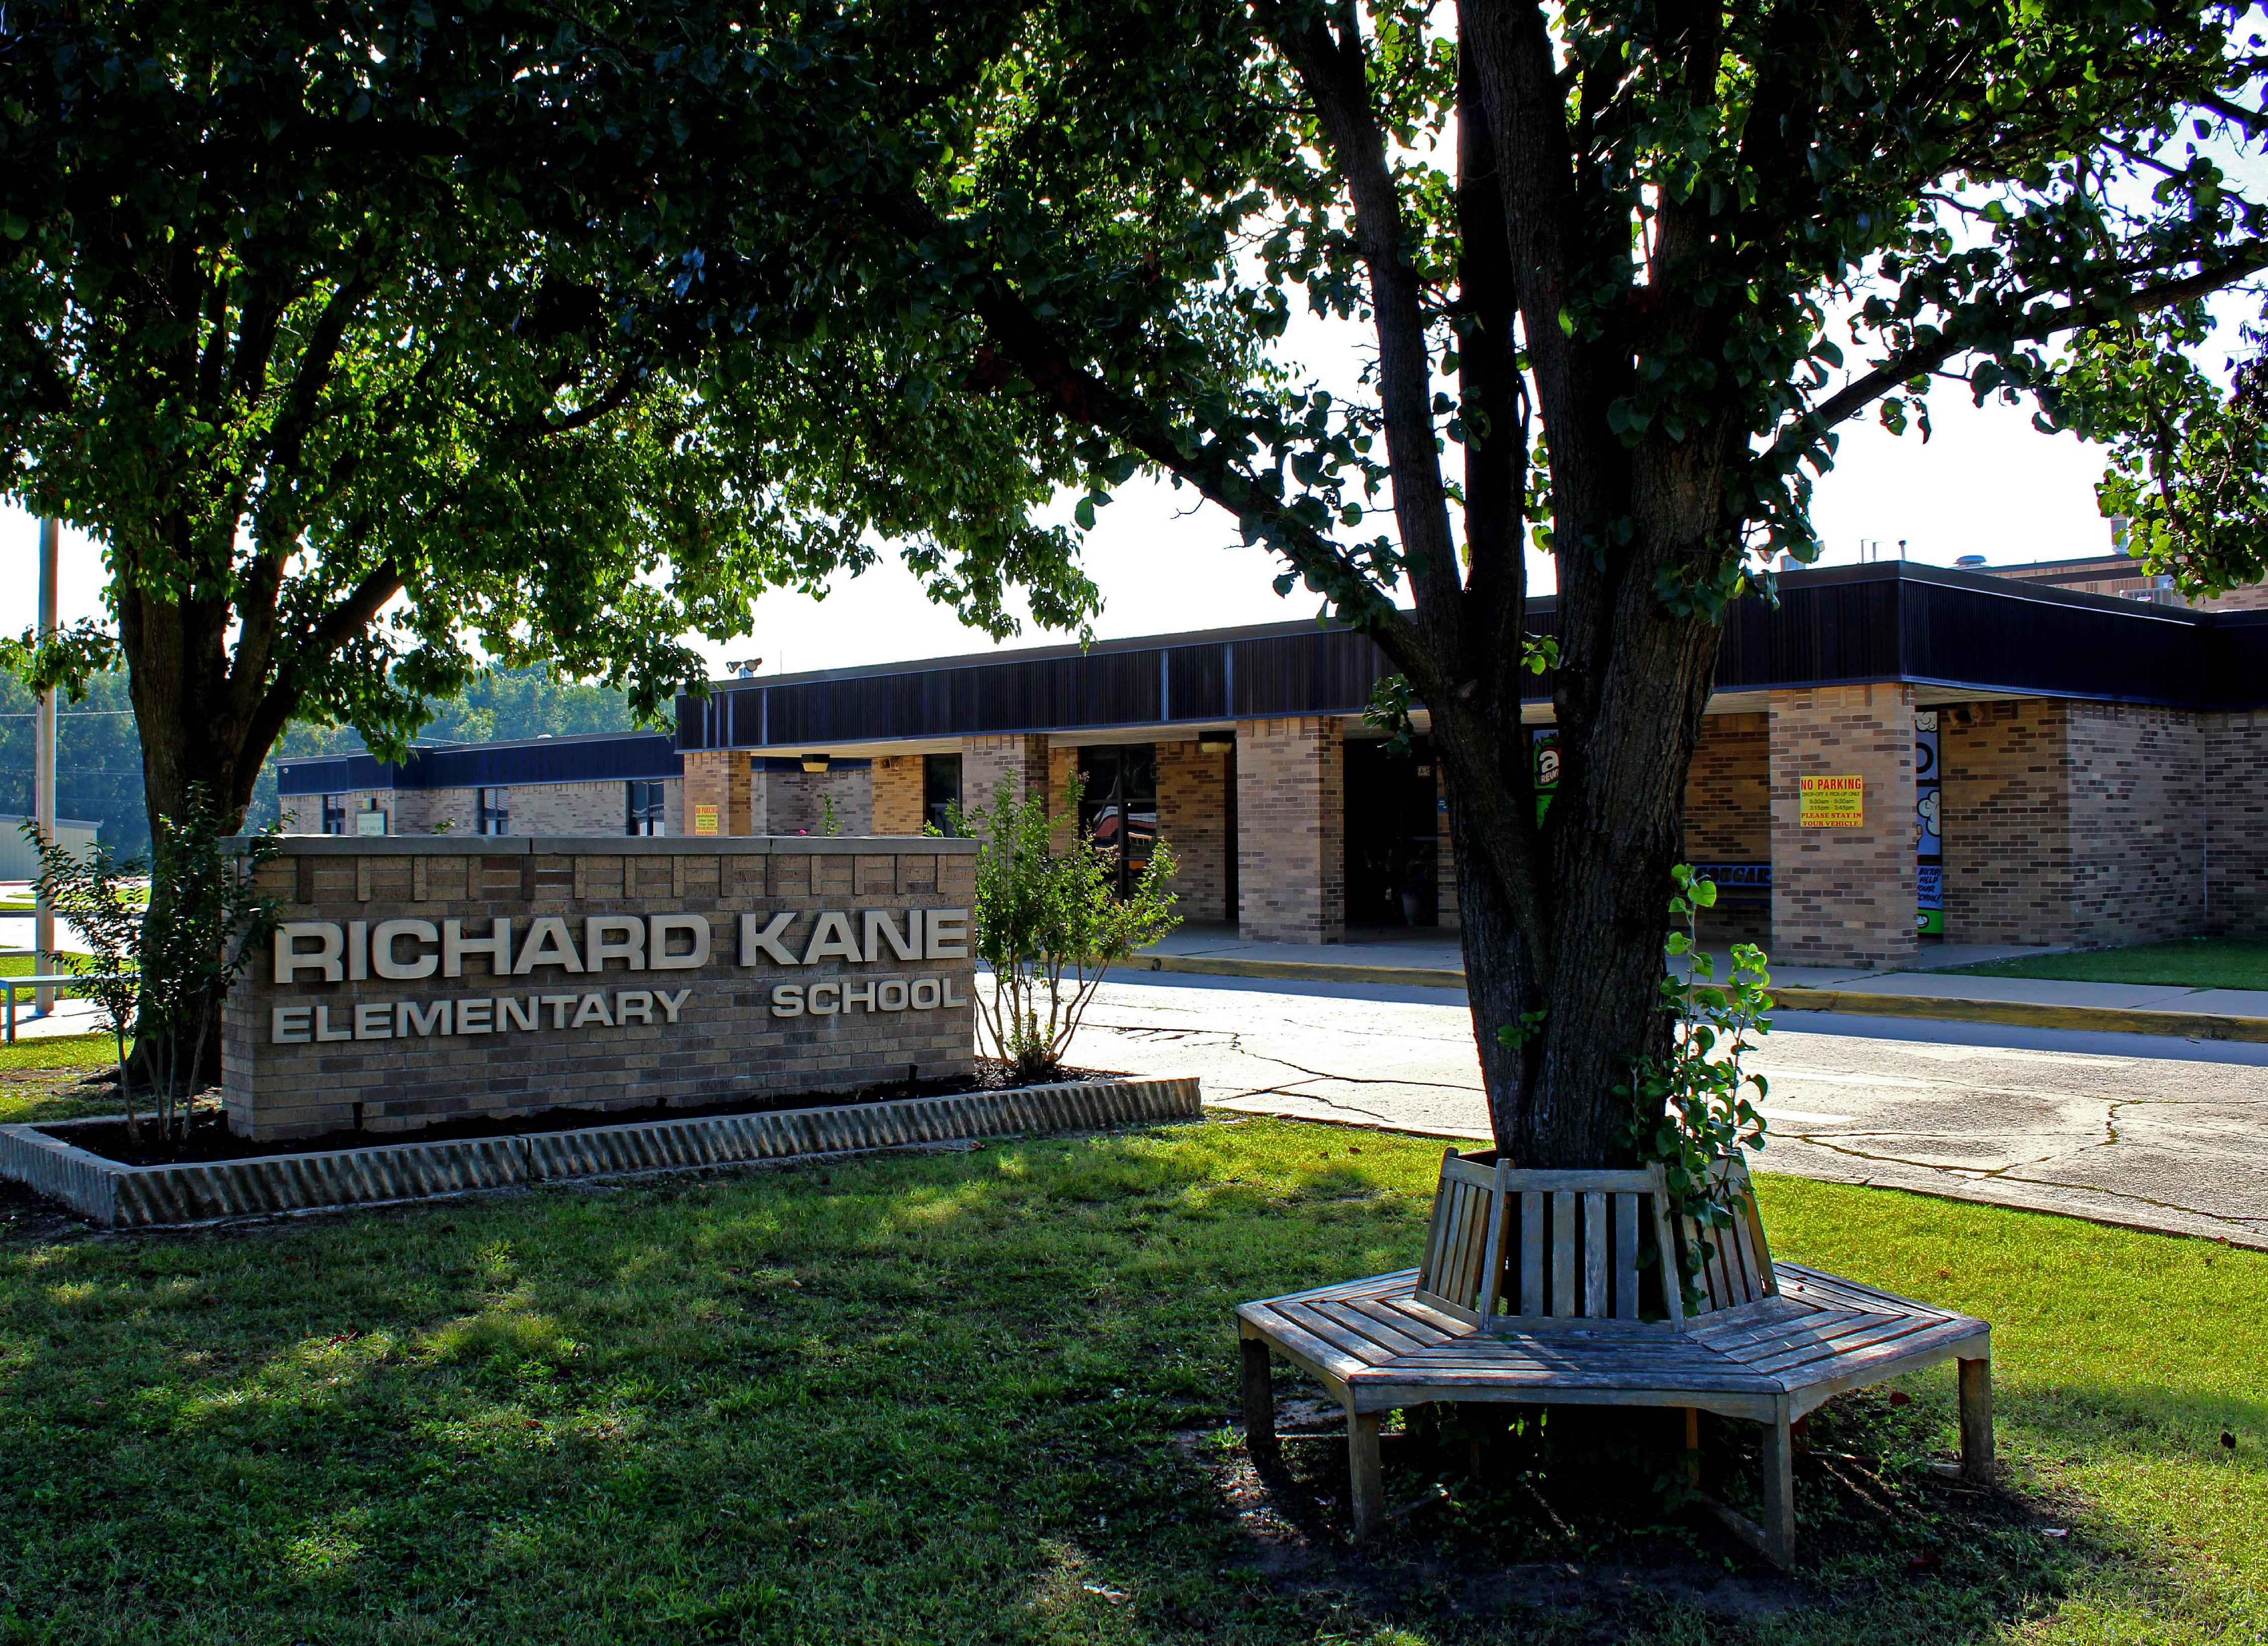 Richard Kane Elementary